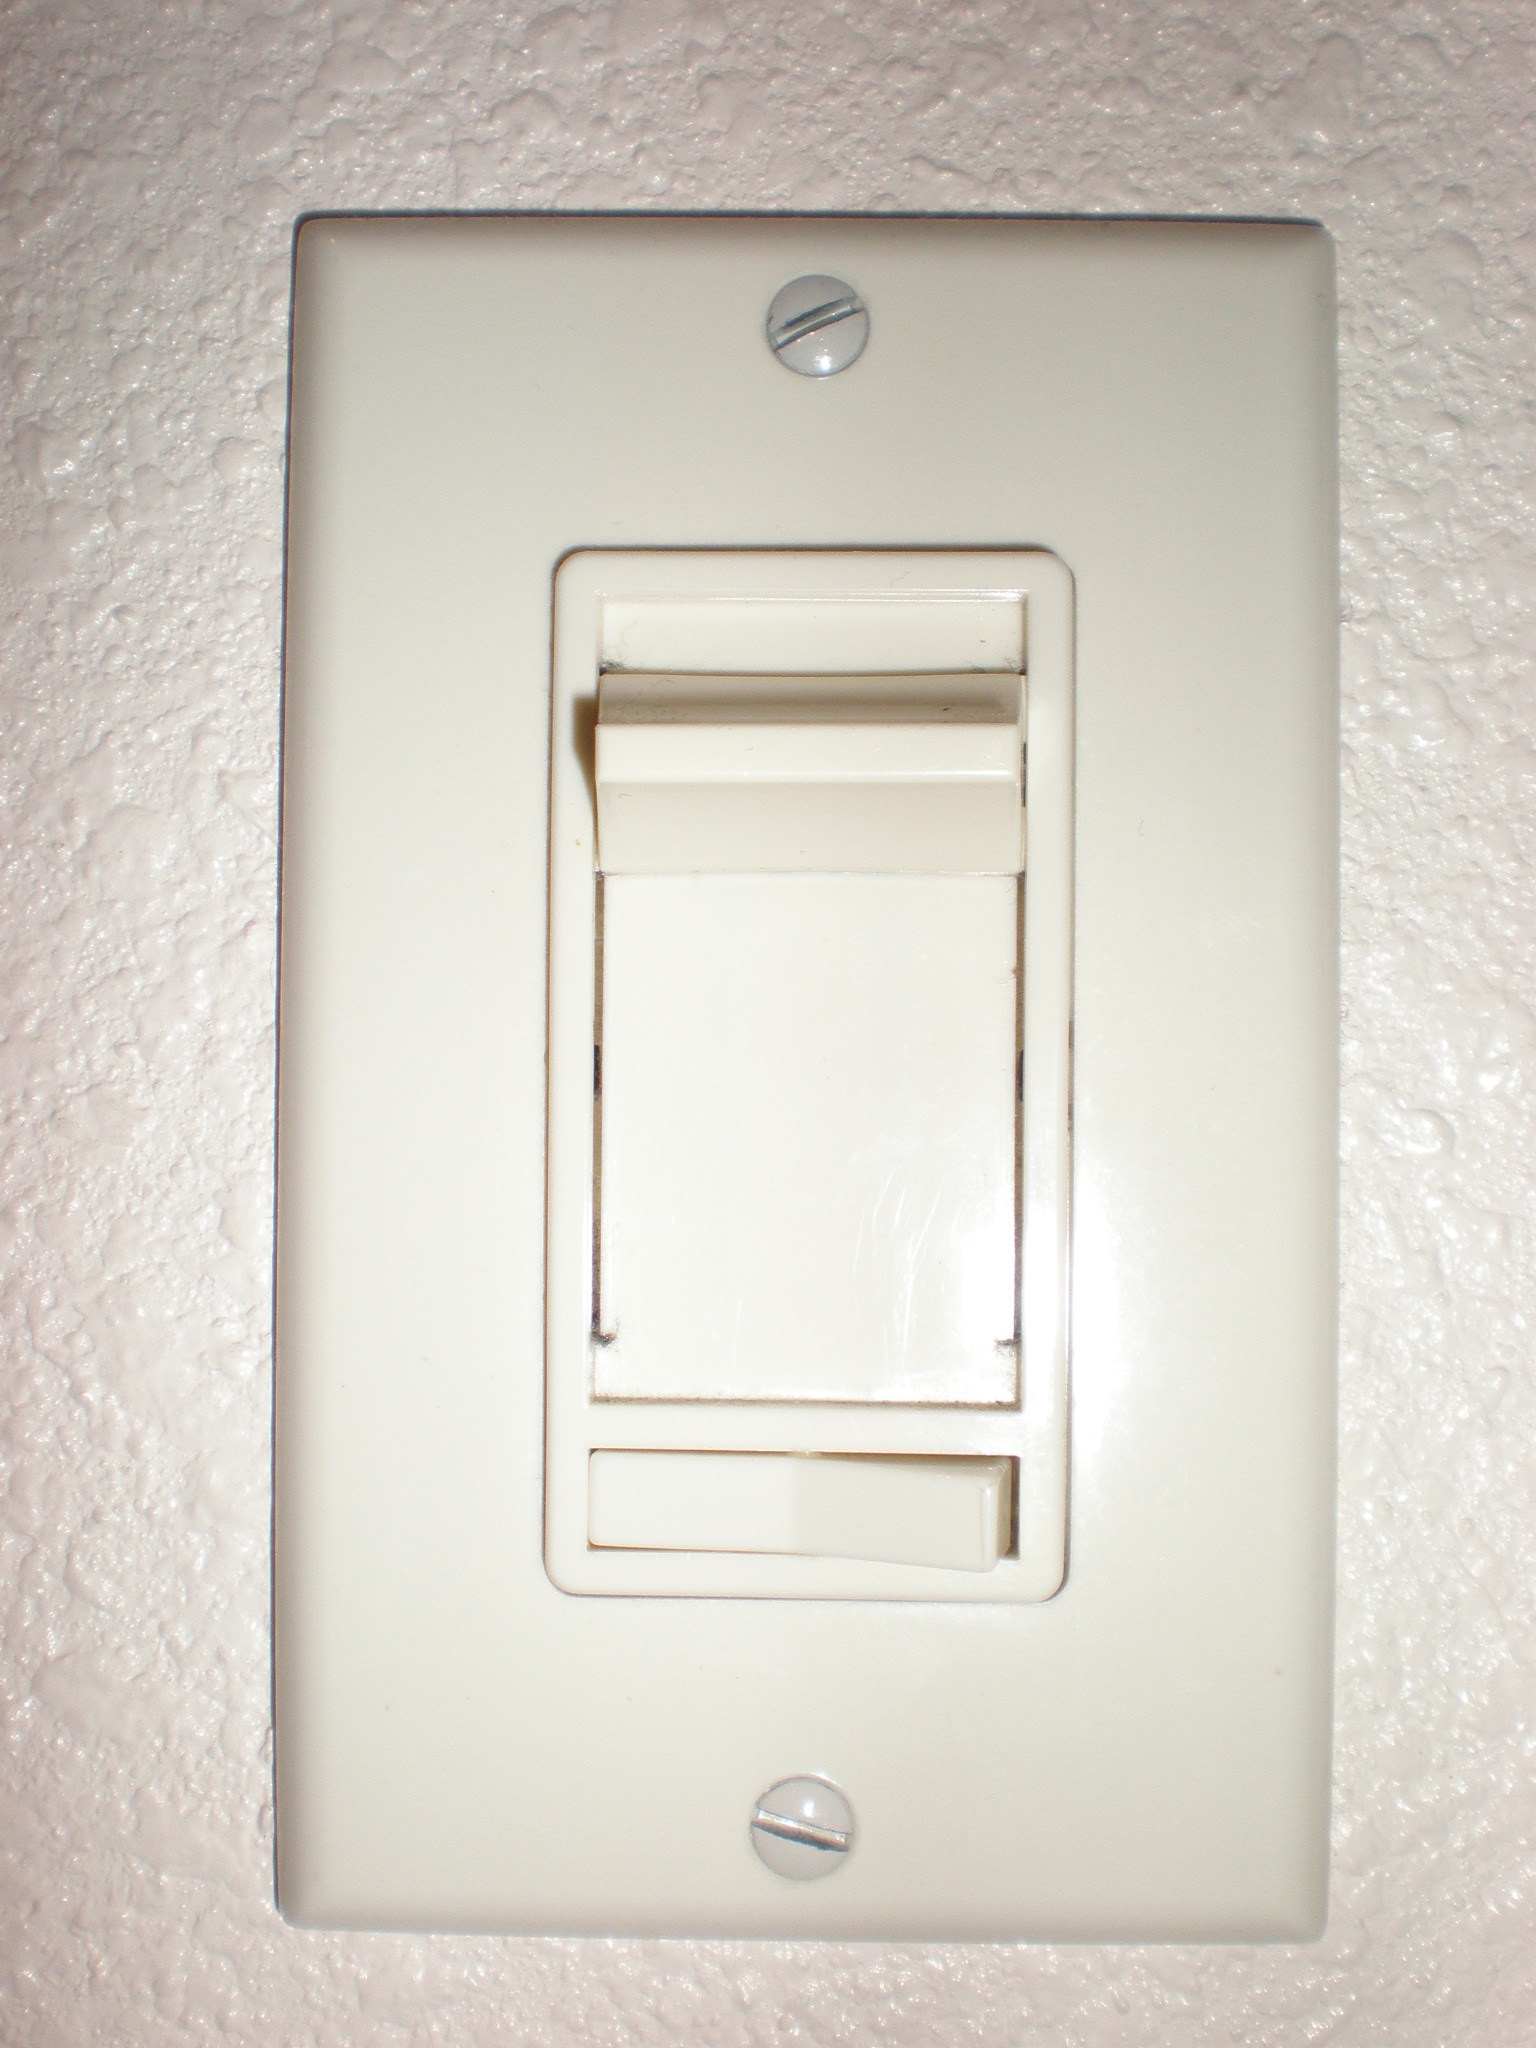 light wall plates photo - 6